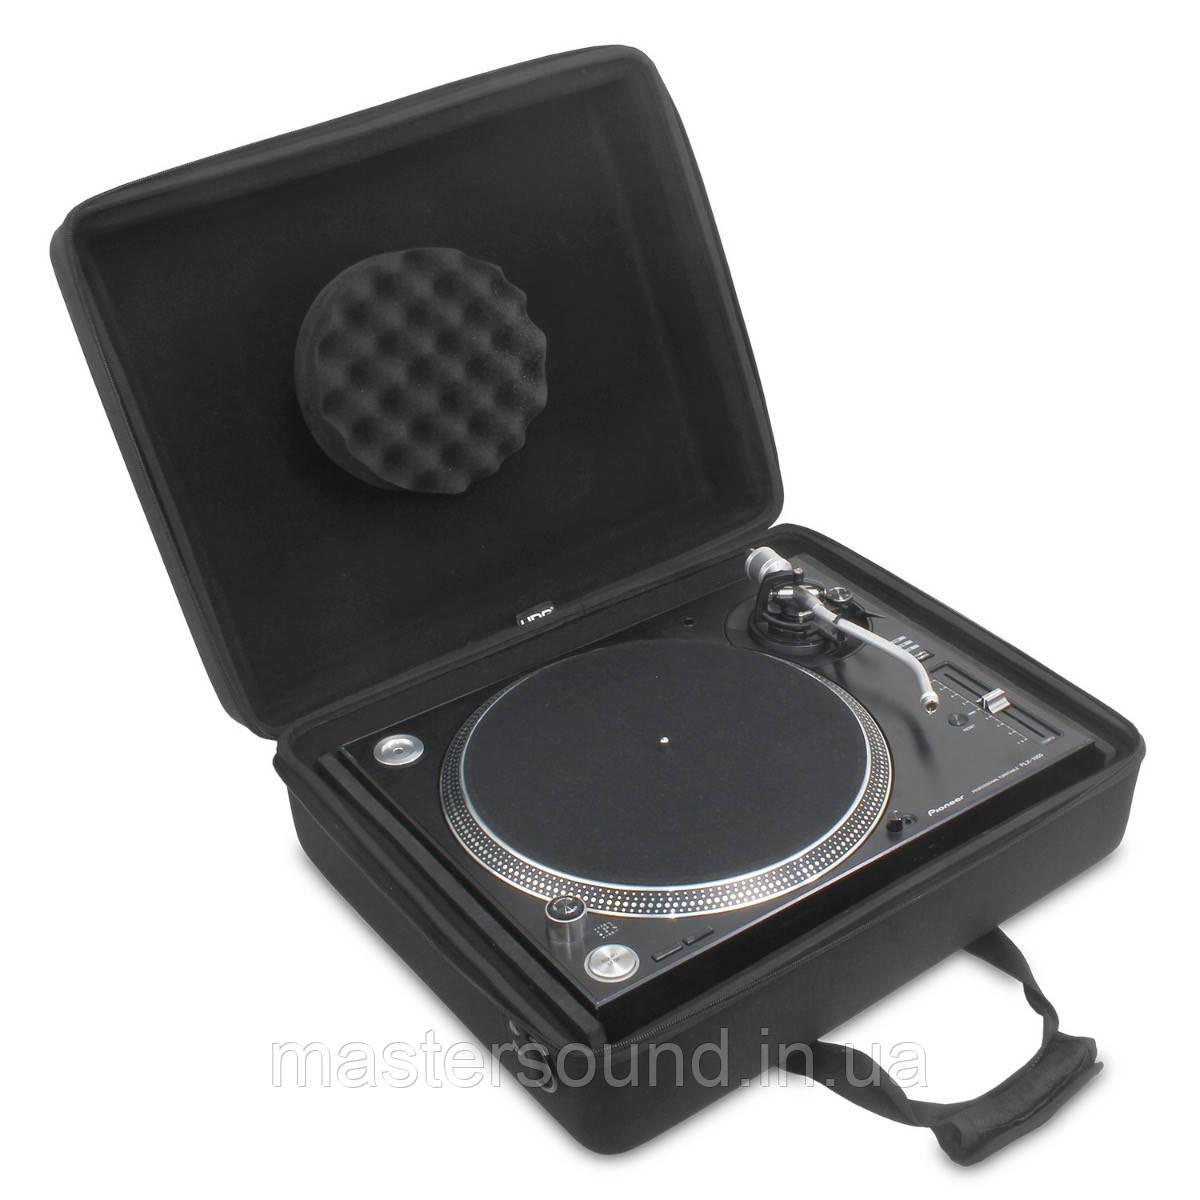 Сумка для проигрывателей пластинок UDG Creator Turntable Hardcase Black